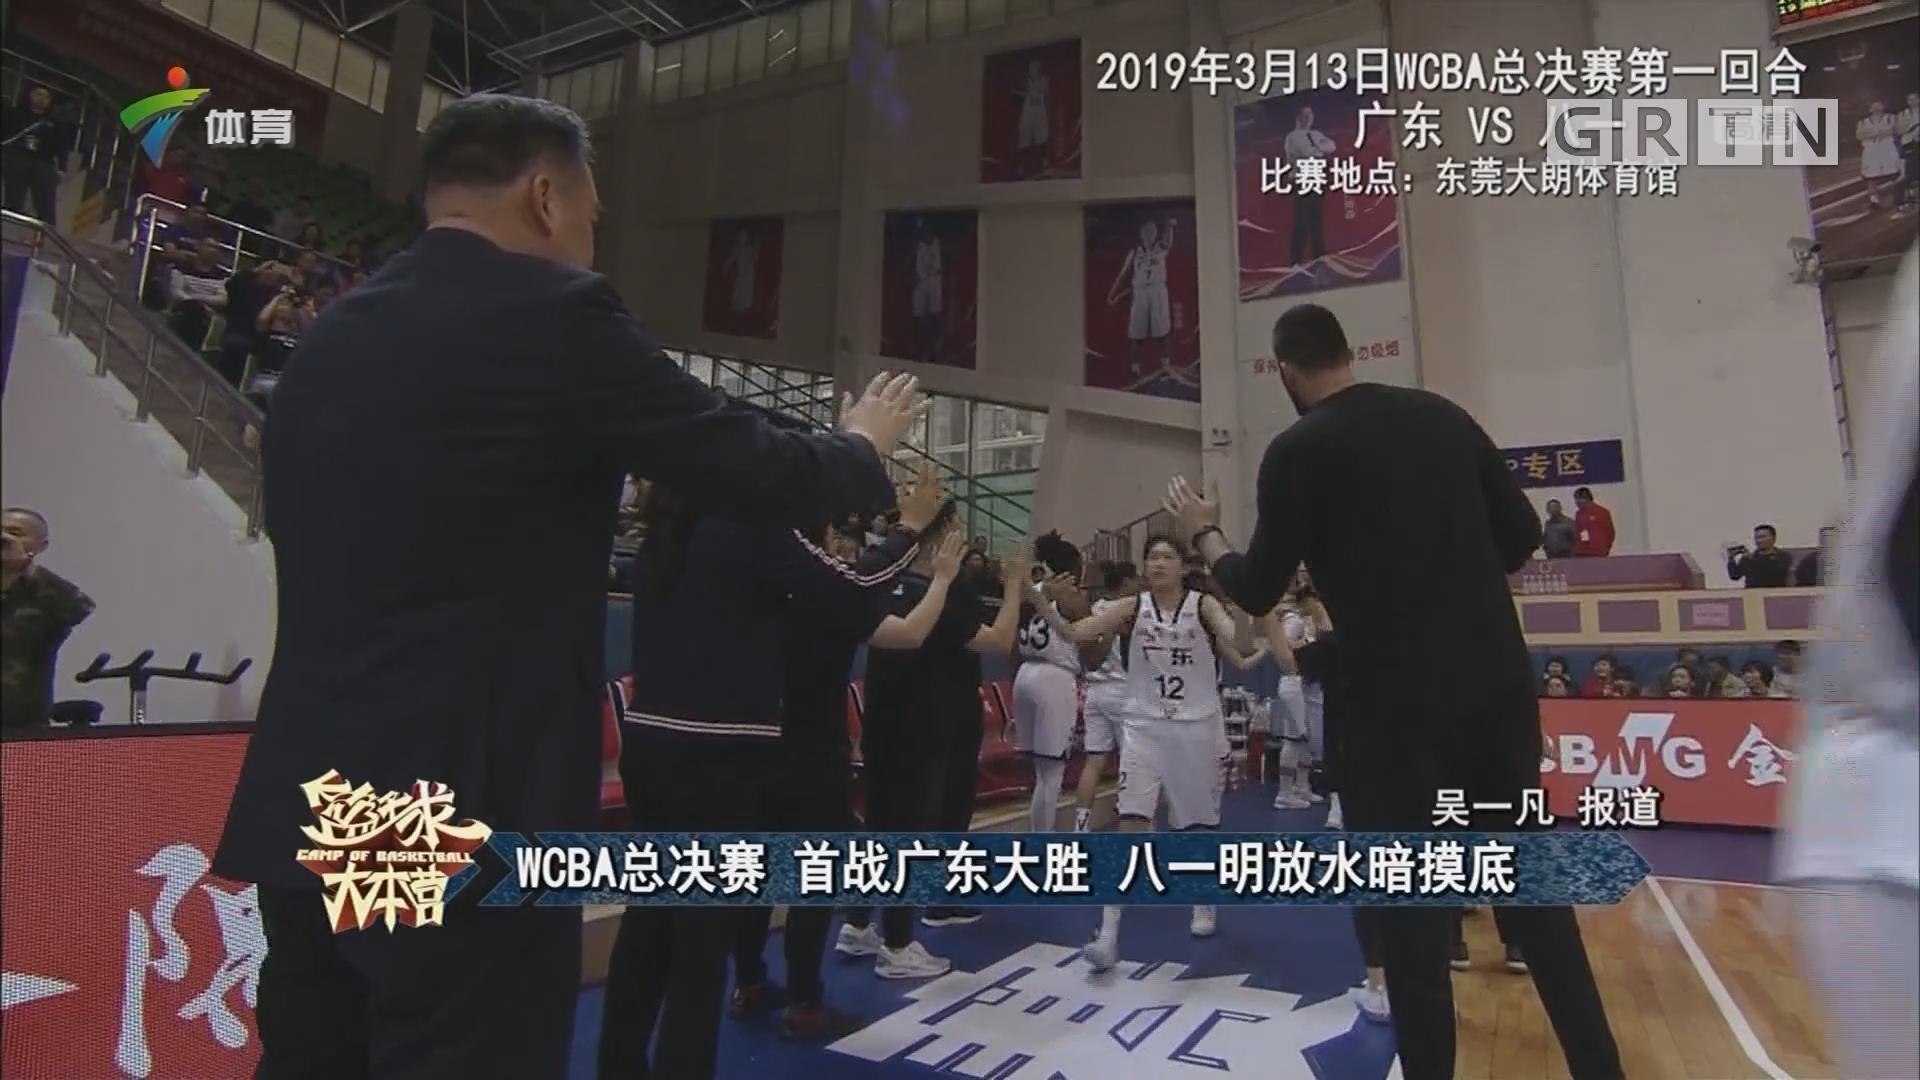 WCBA总决赛 首战广东大胜 八一明放水暗摸底